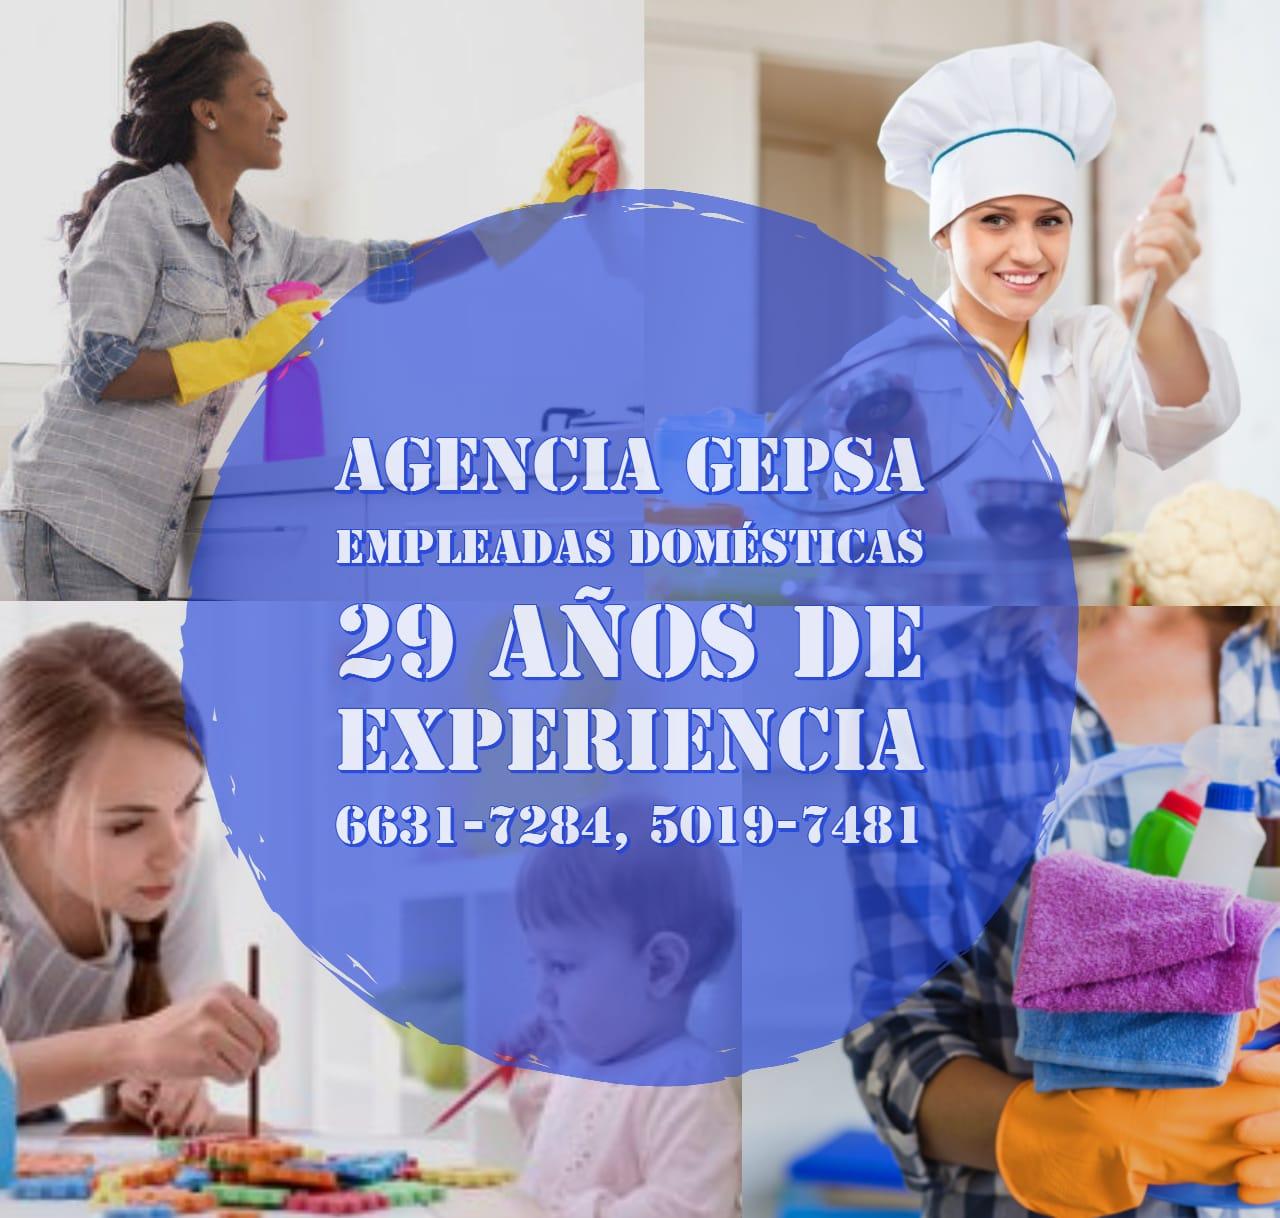 Servicio de Empleadas Domésticas Garantizado, Agencia GEPSA